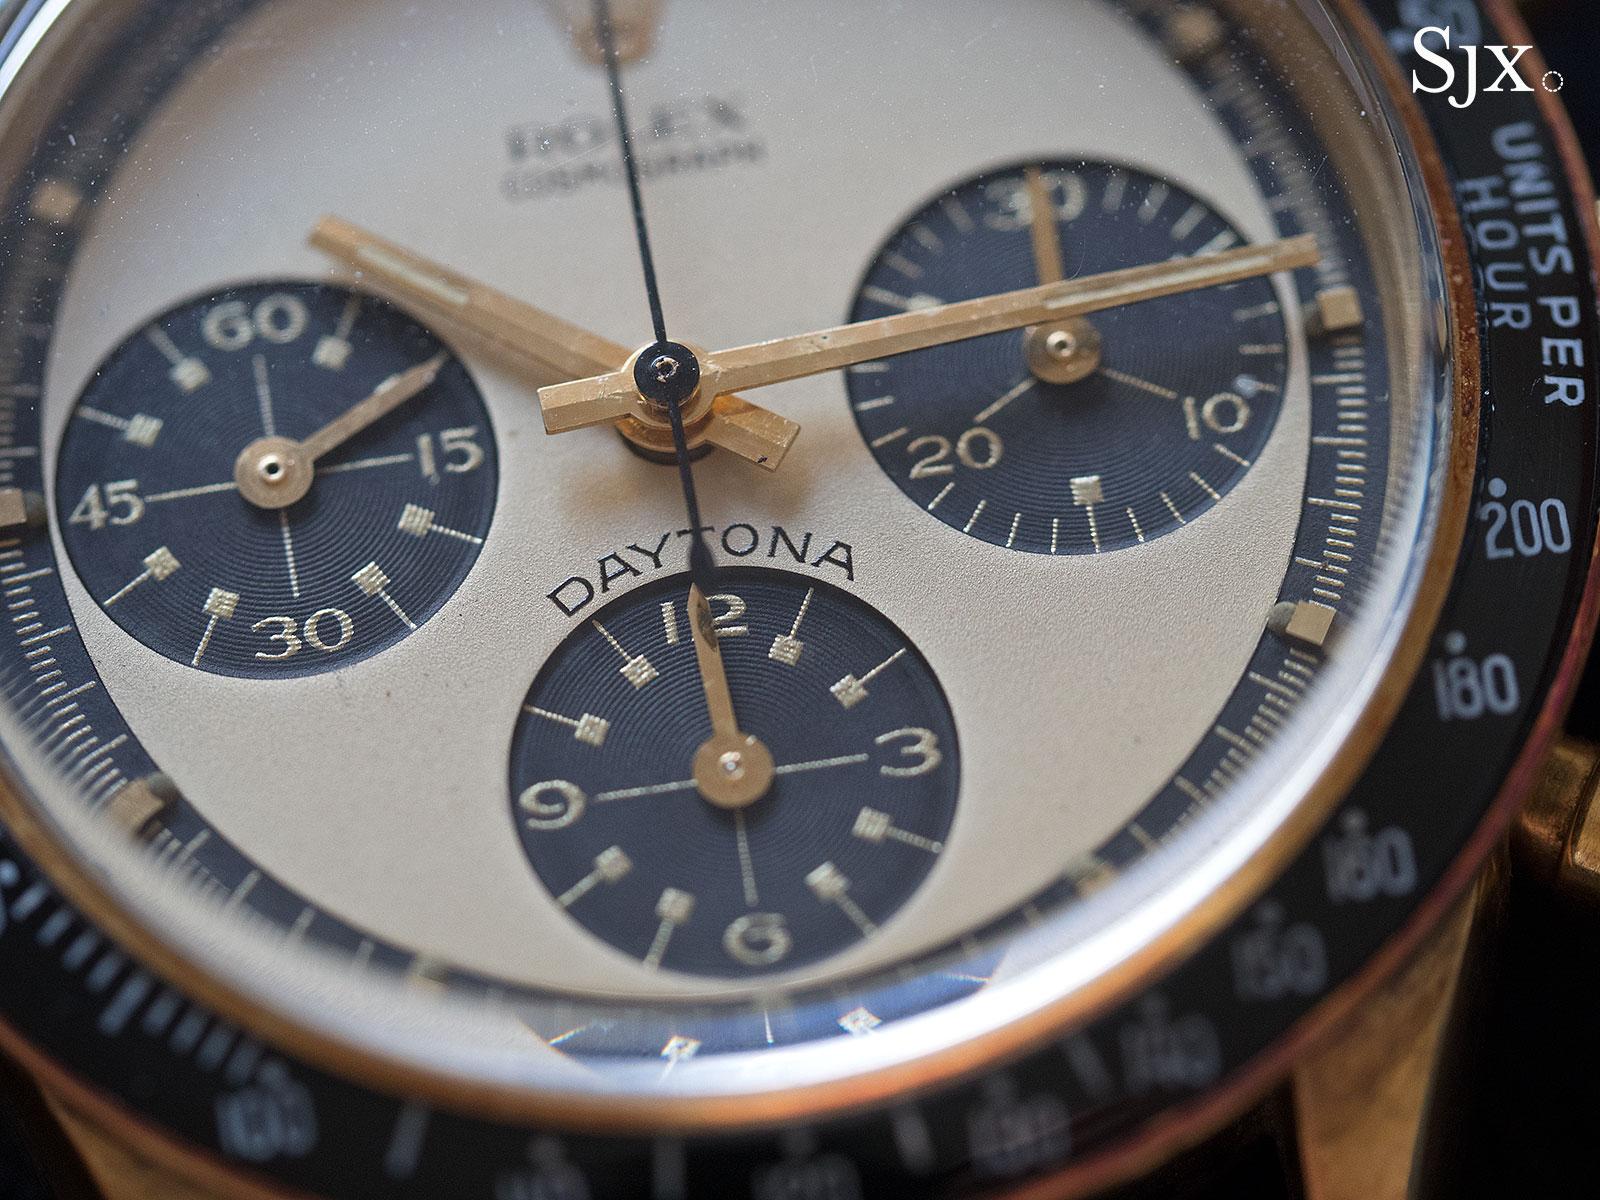 Rolex Daytona Paul Newman 6241-1